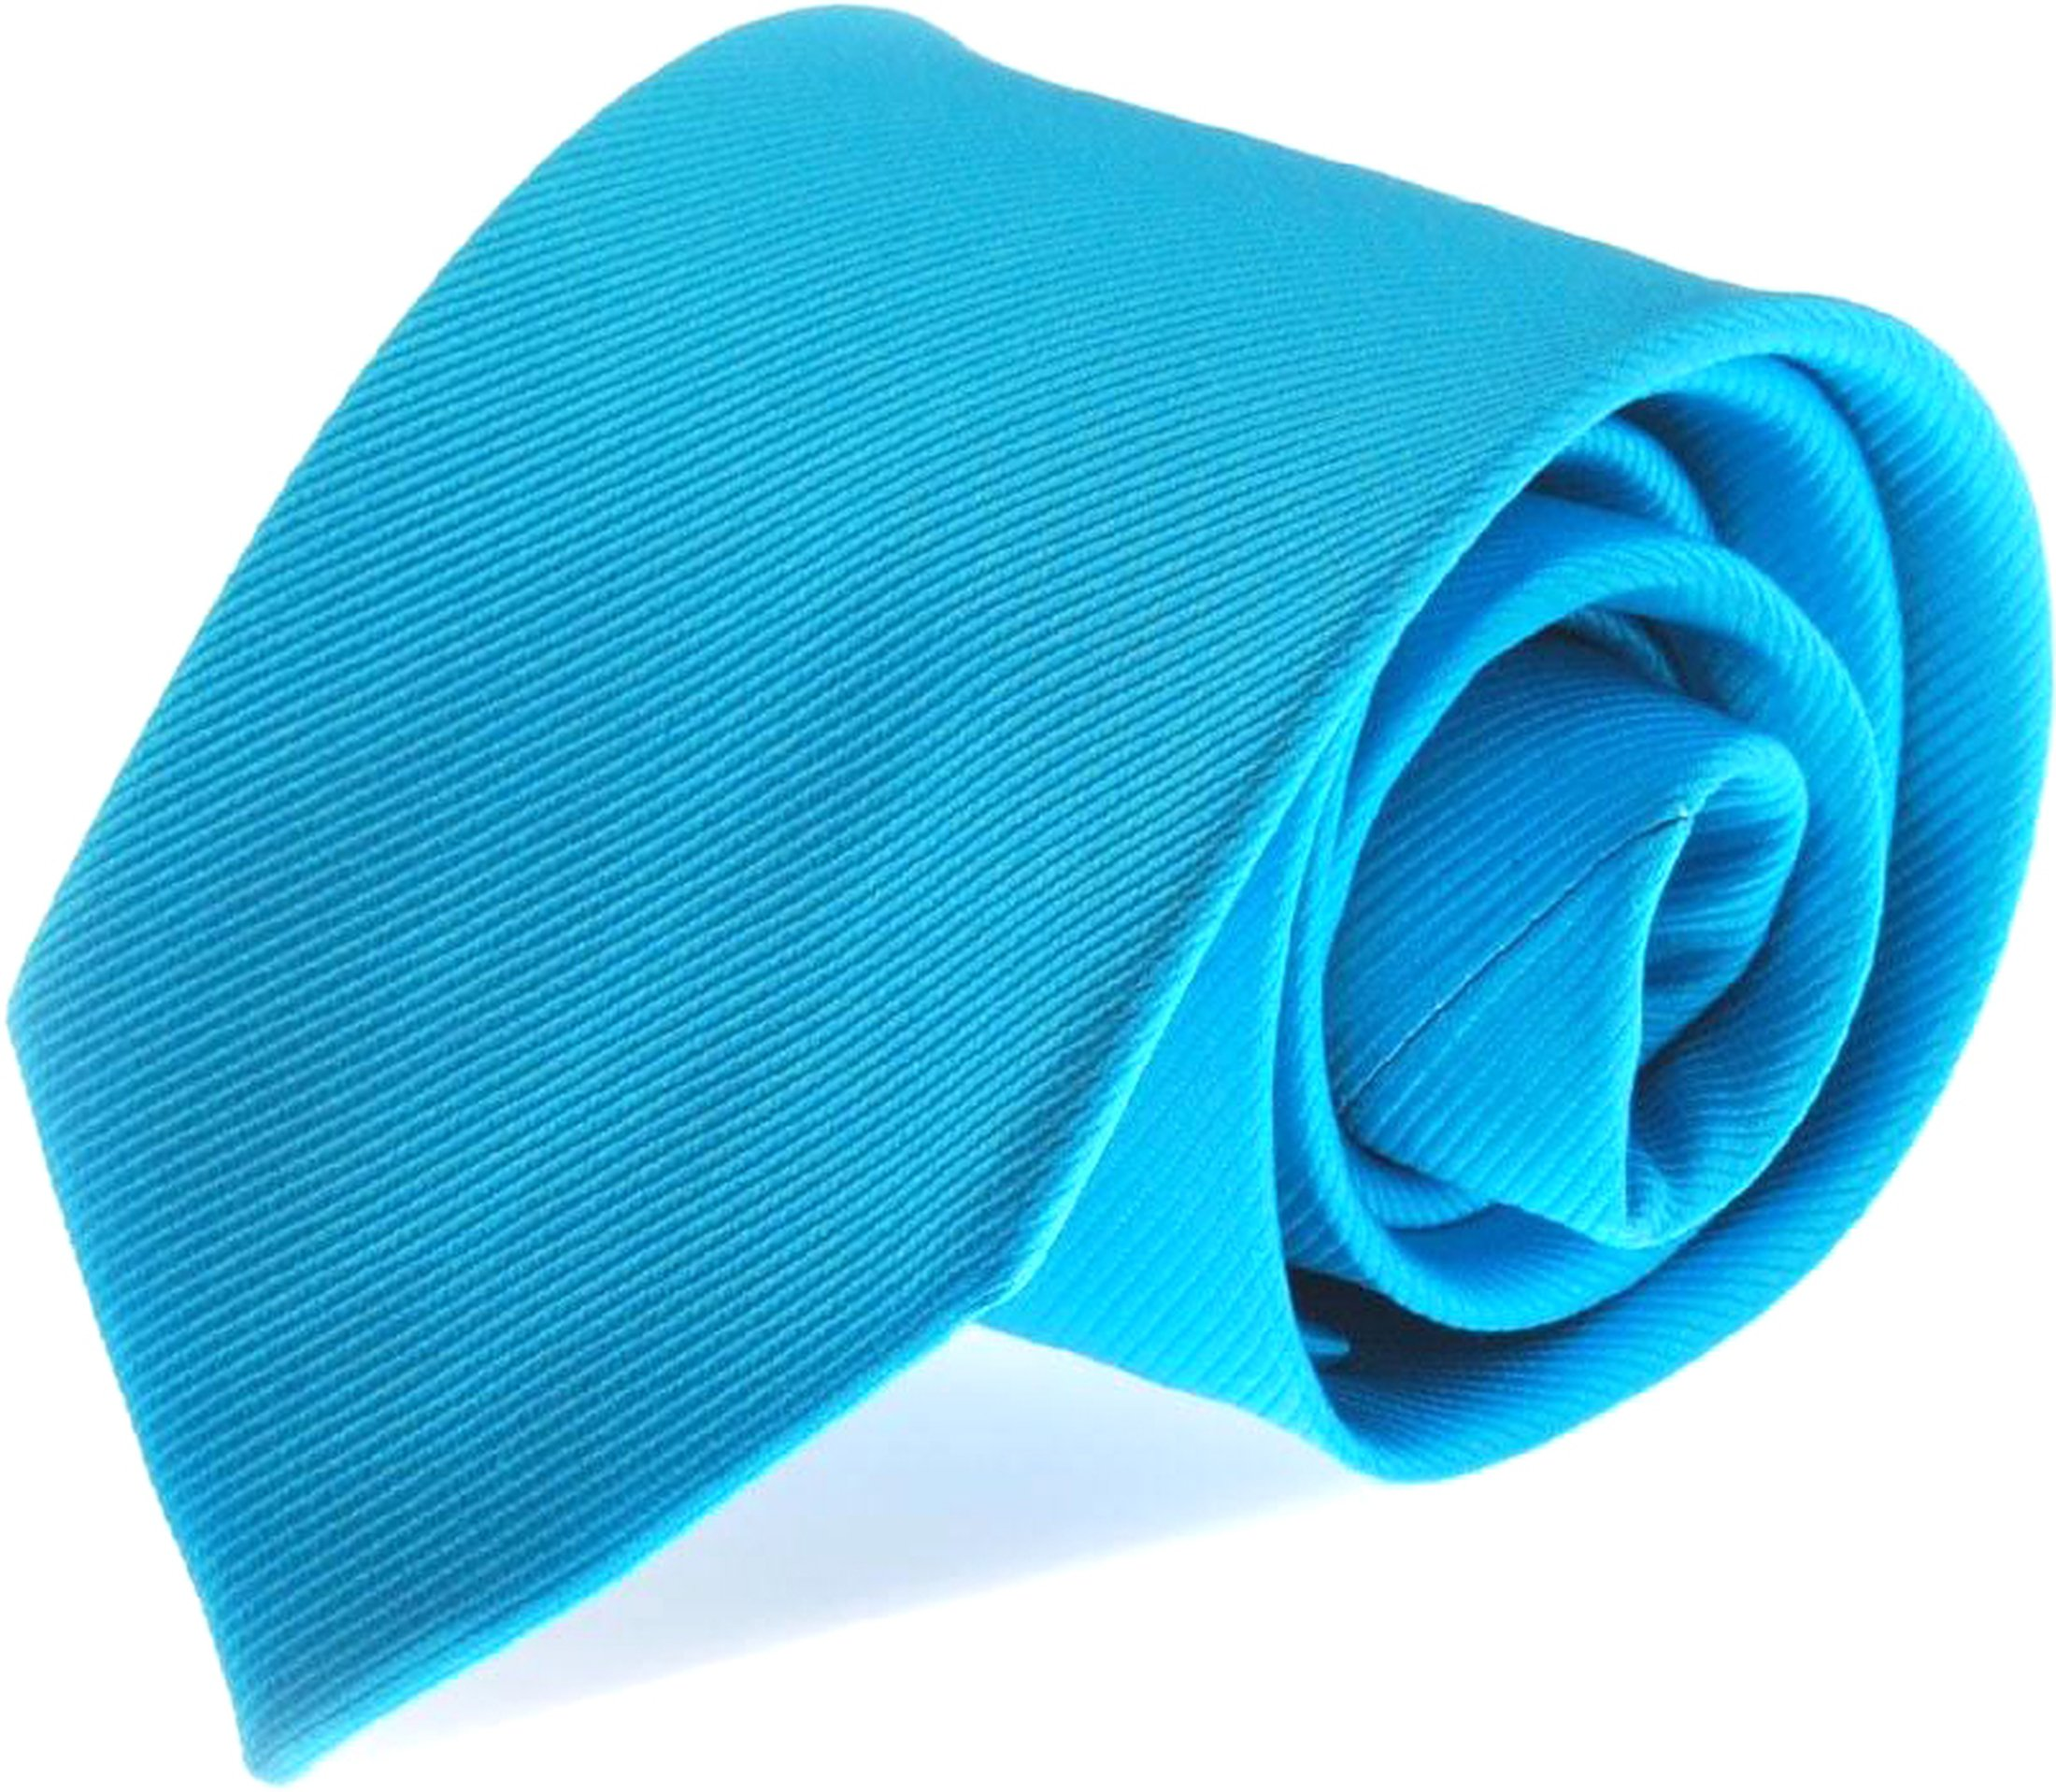 Silk Tie Turquoise F24 foto 0